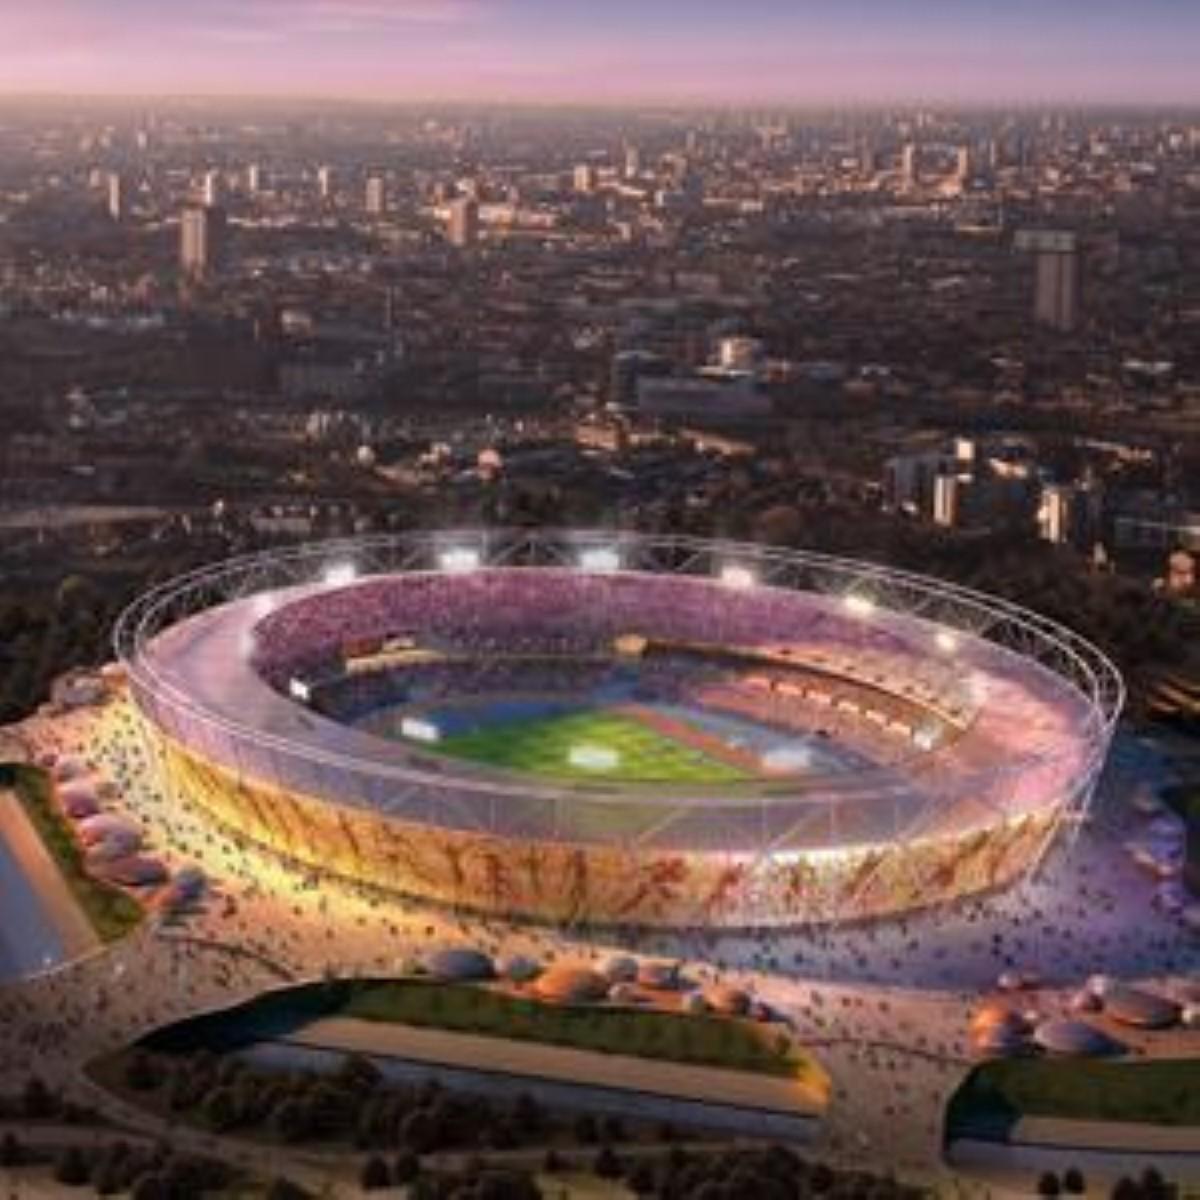 London 2012 Olympic opening ceremony: A celebration of freedom.